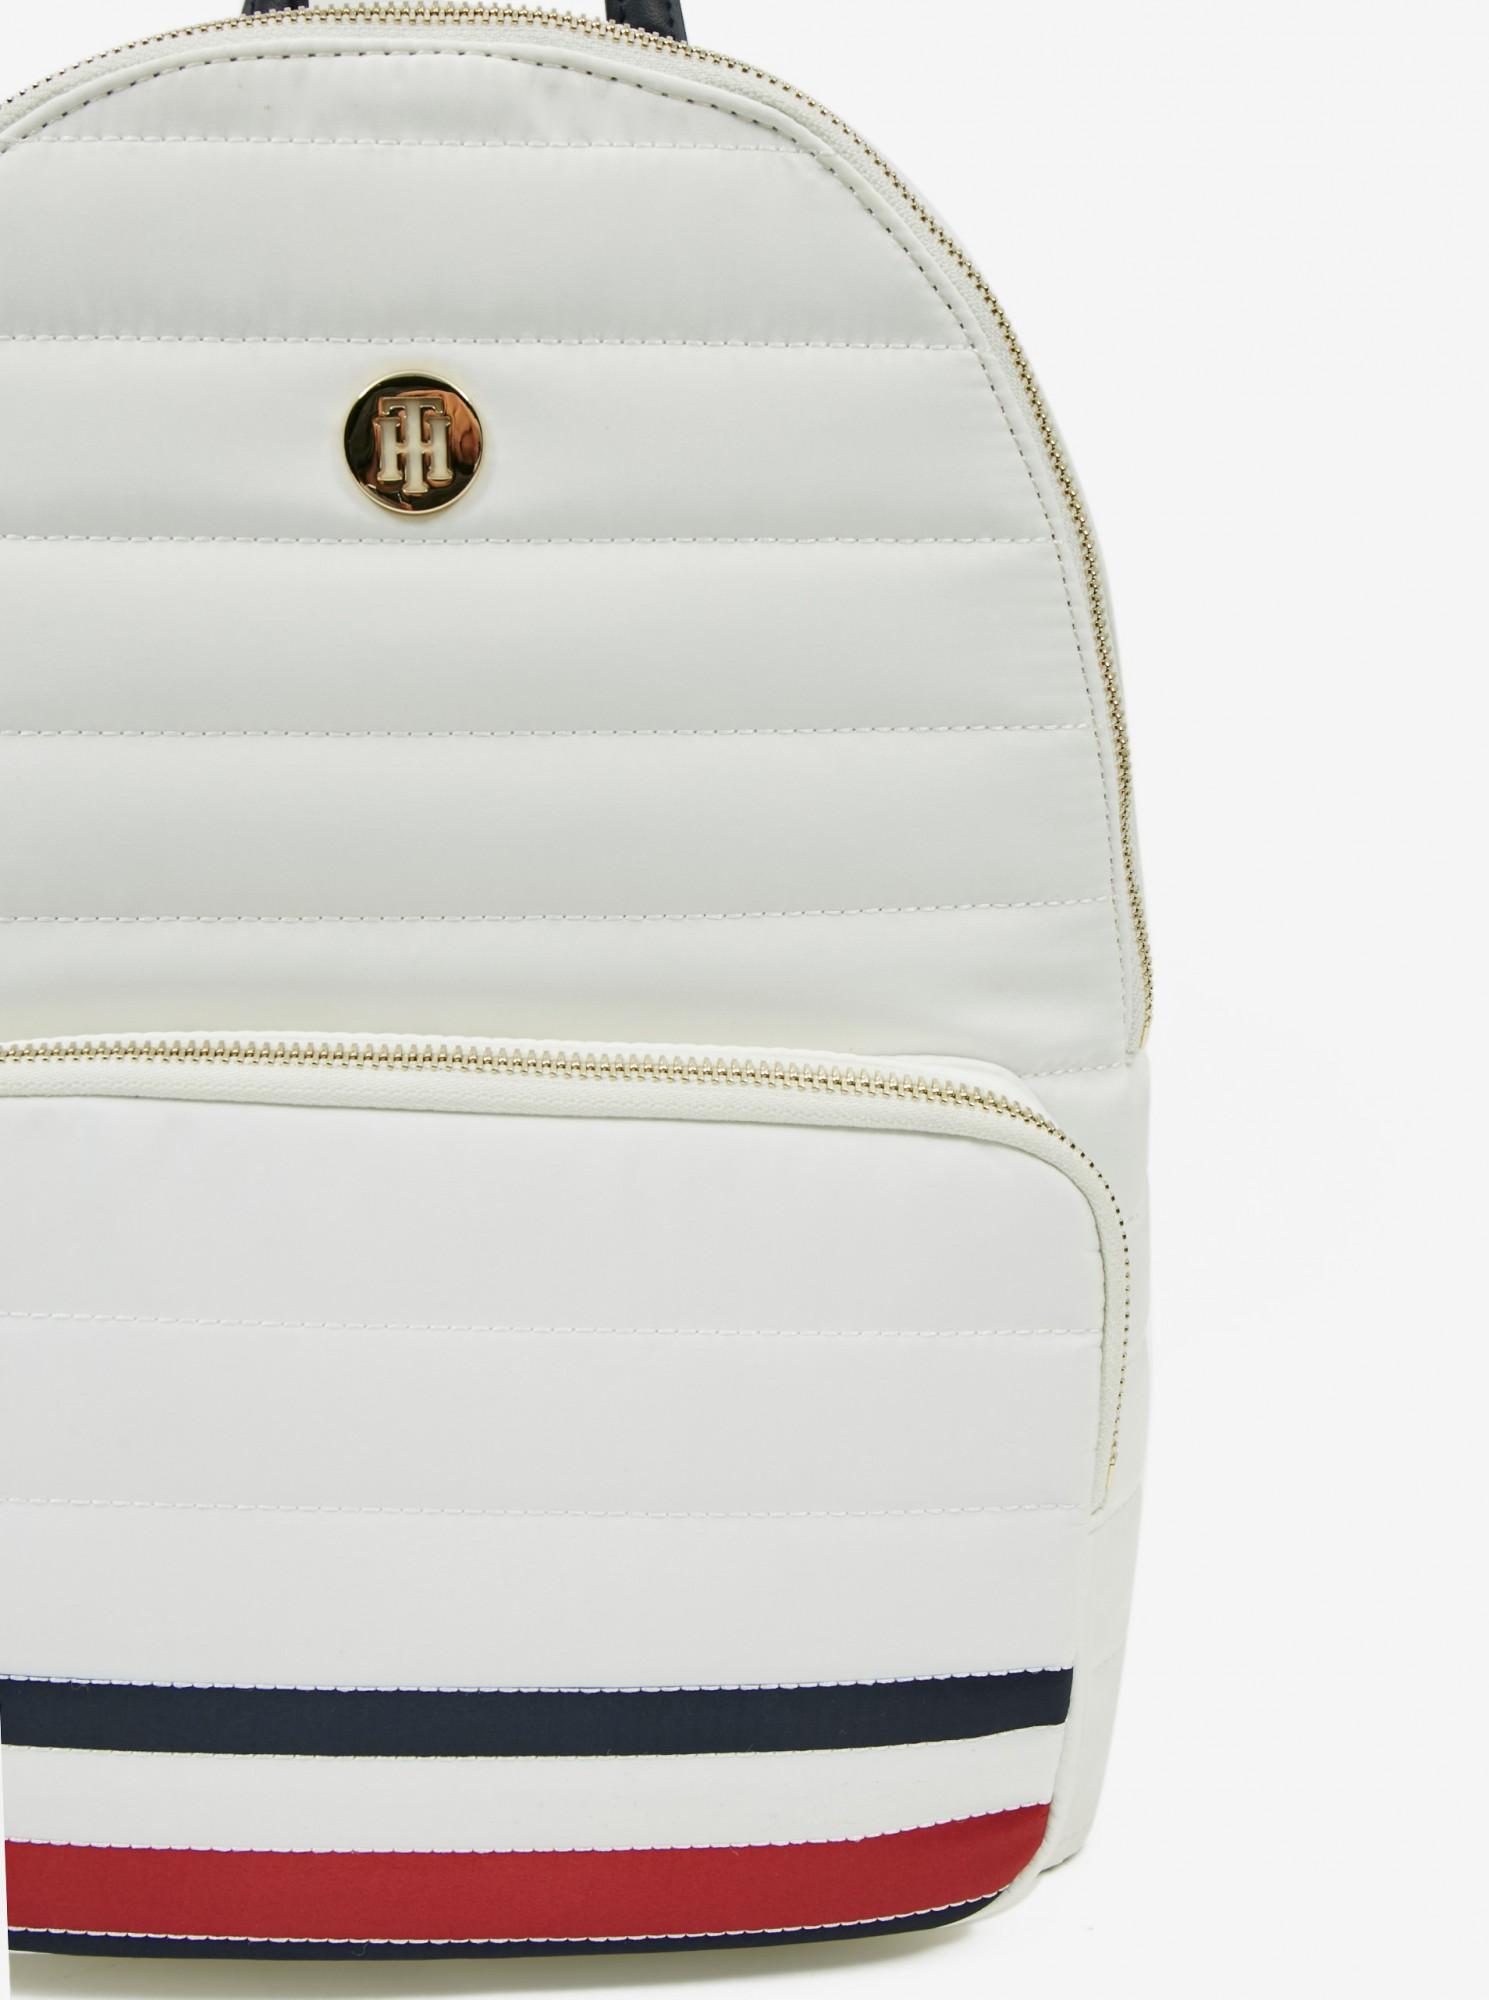 Tommy Hilfiger white backpack